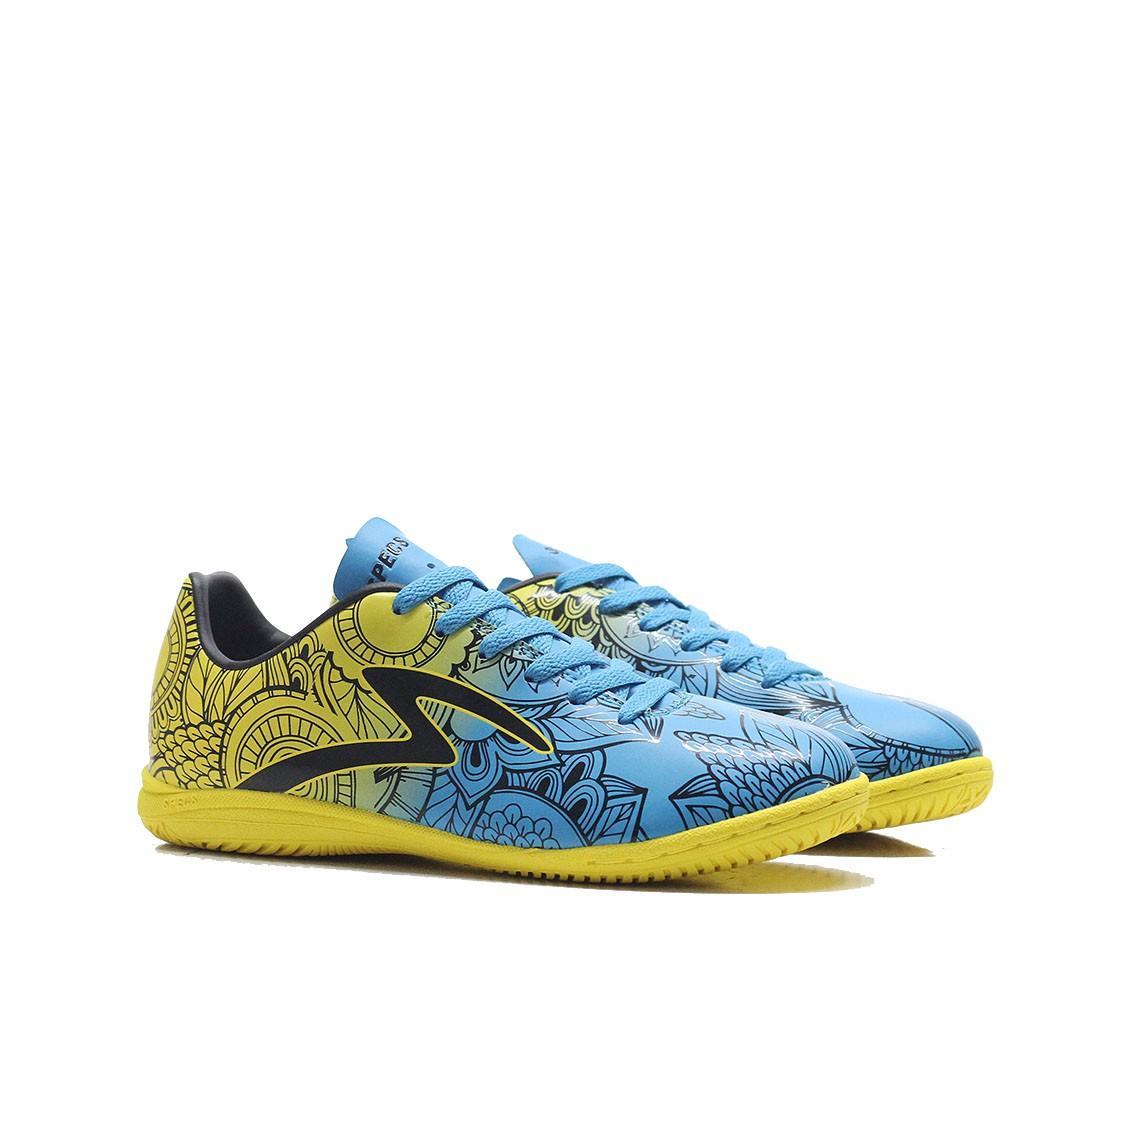 Sepatu Futsal Pria Specs Terbaru  Sepaket Komplit Speder